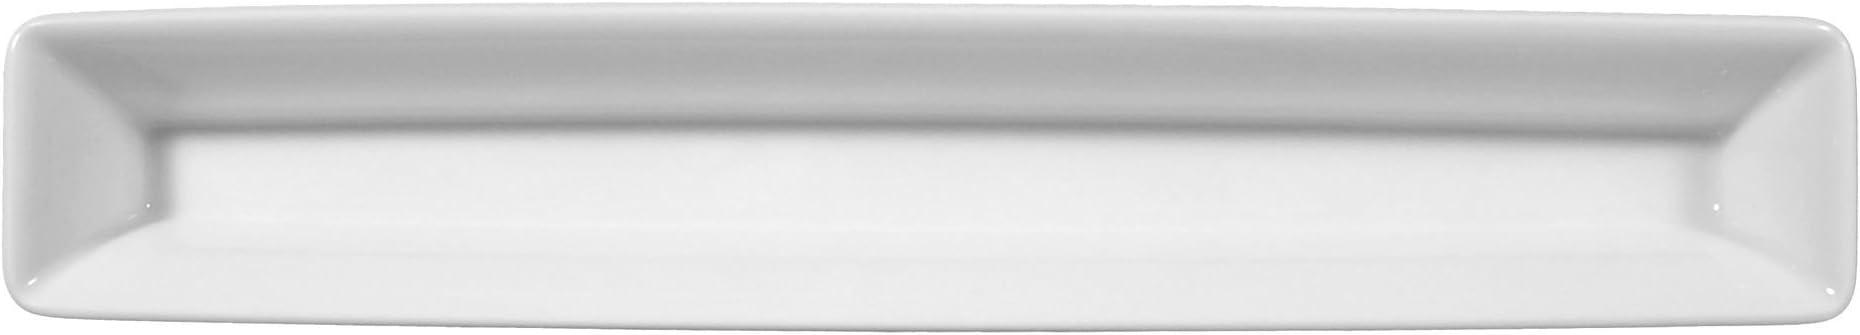 Schale 5140 5x30 Cm Buffet Gourmet Weiss Uni 00006 Von Seltmann Weiden Küche Haushalt